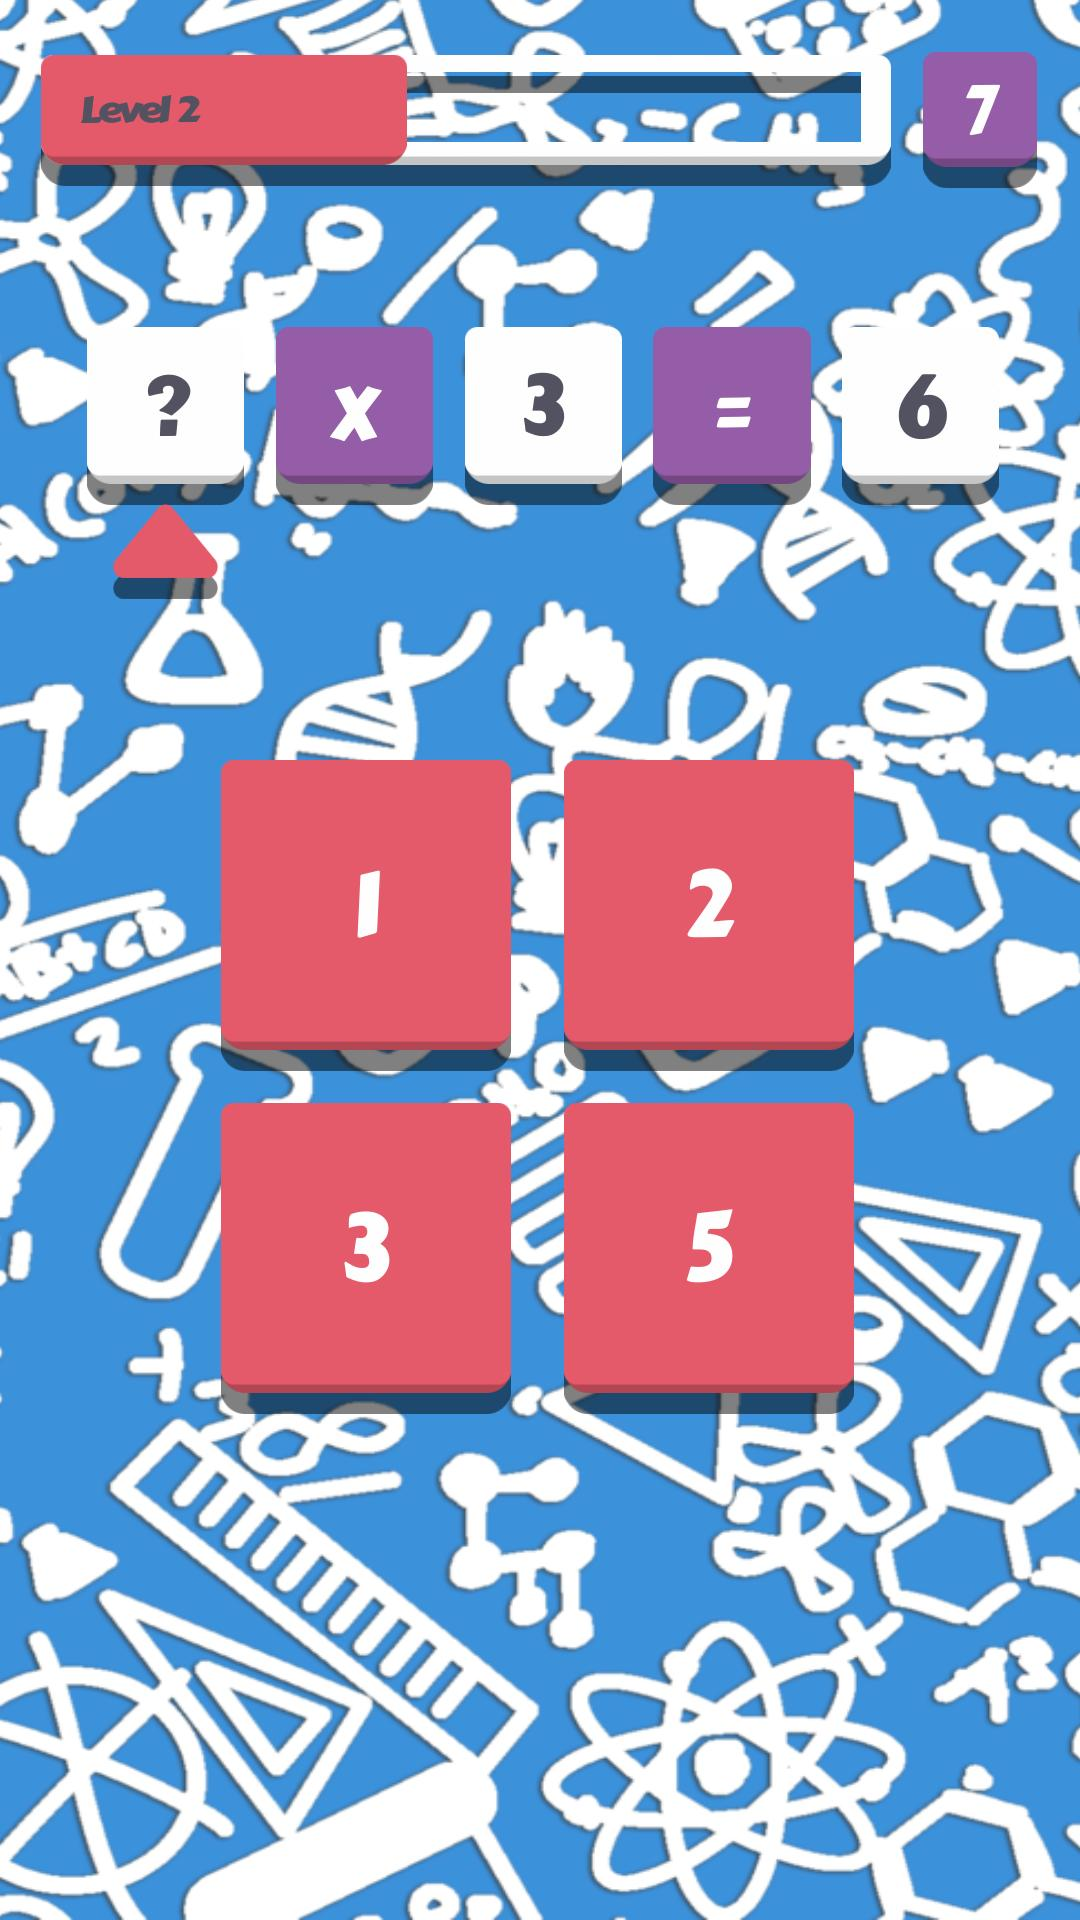 Matka - Matematika za svakoga screenshot 4